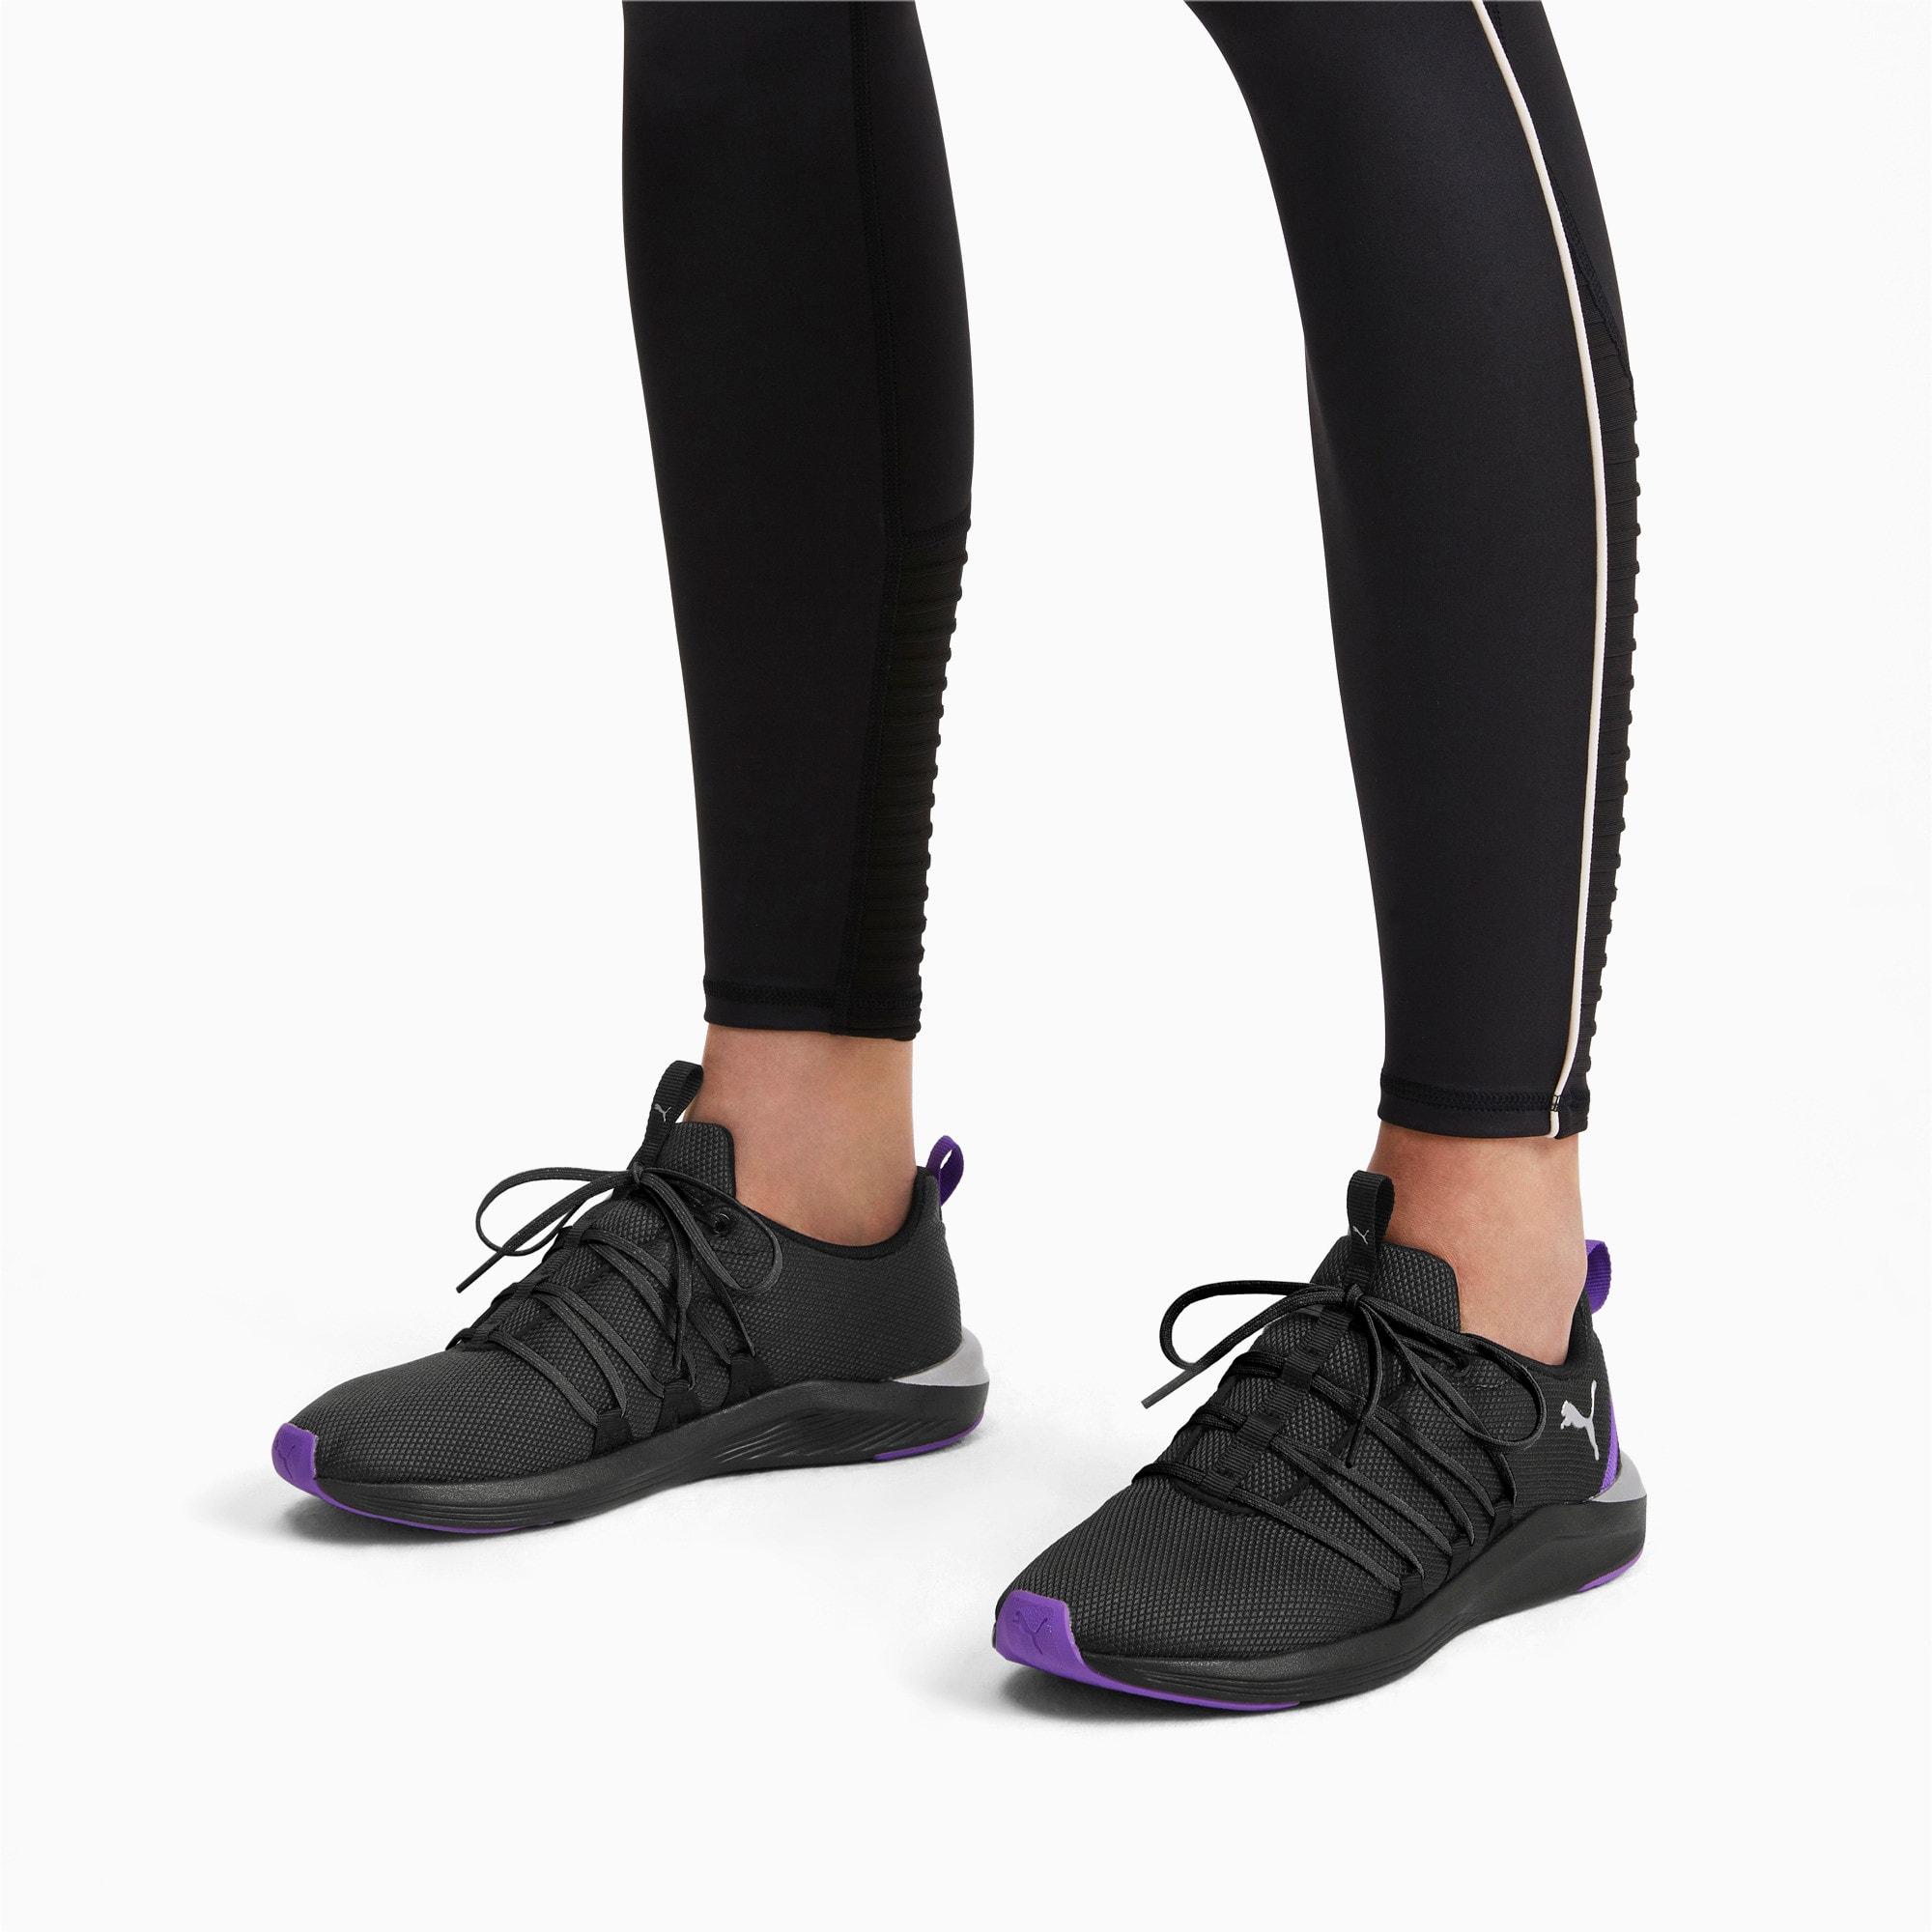 Thumbnail 2 of Prowl Alt Metal Women's Training Shoes, Puma Black-Purple Glimmer, medium